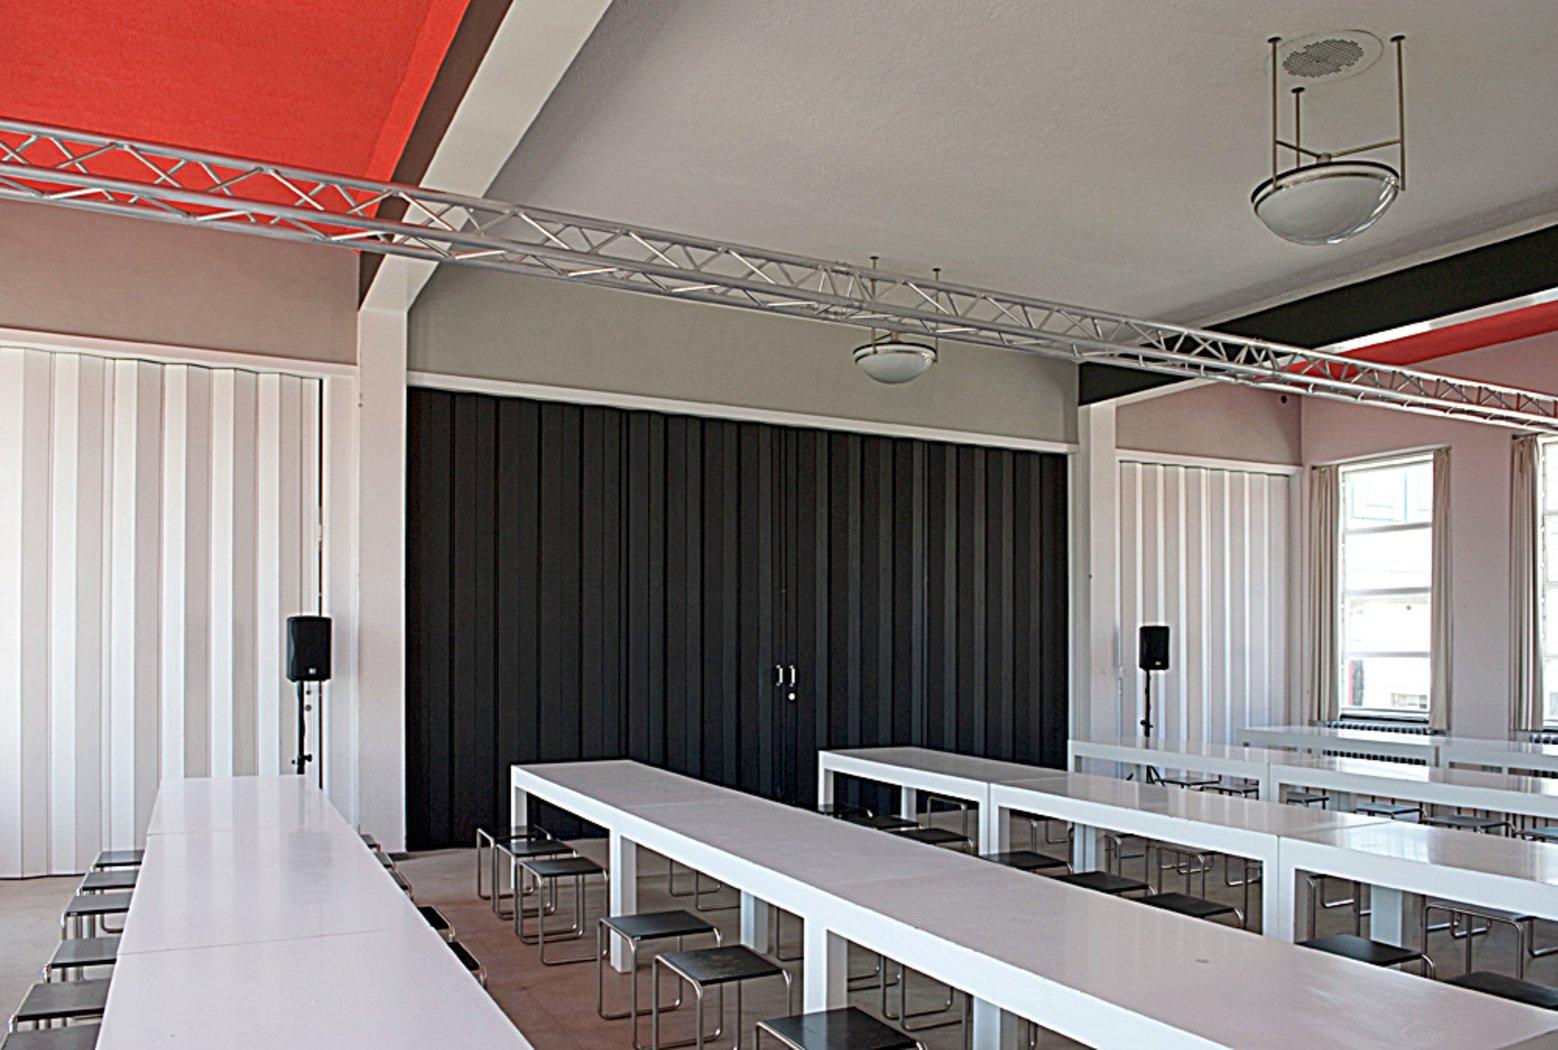 bauhausmensa essen an historischem ort gastronomie stiftung bauhaus dessau bauhaus. Black Bedroom Furniture Sets. Home Design Ideas